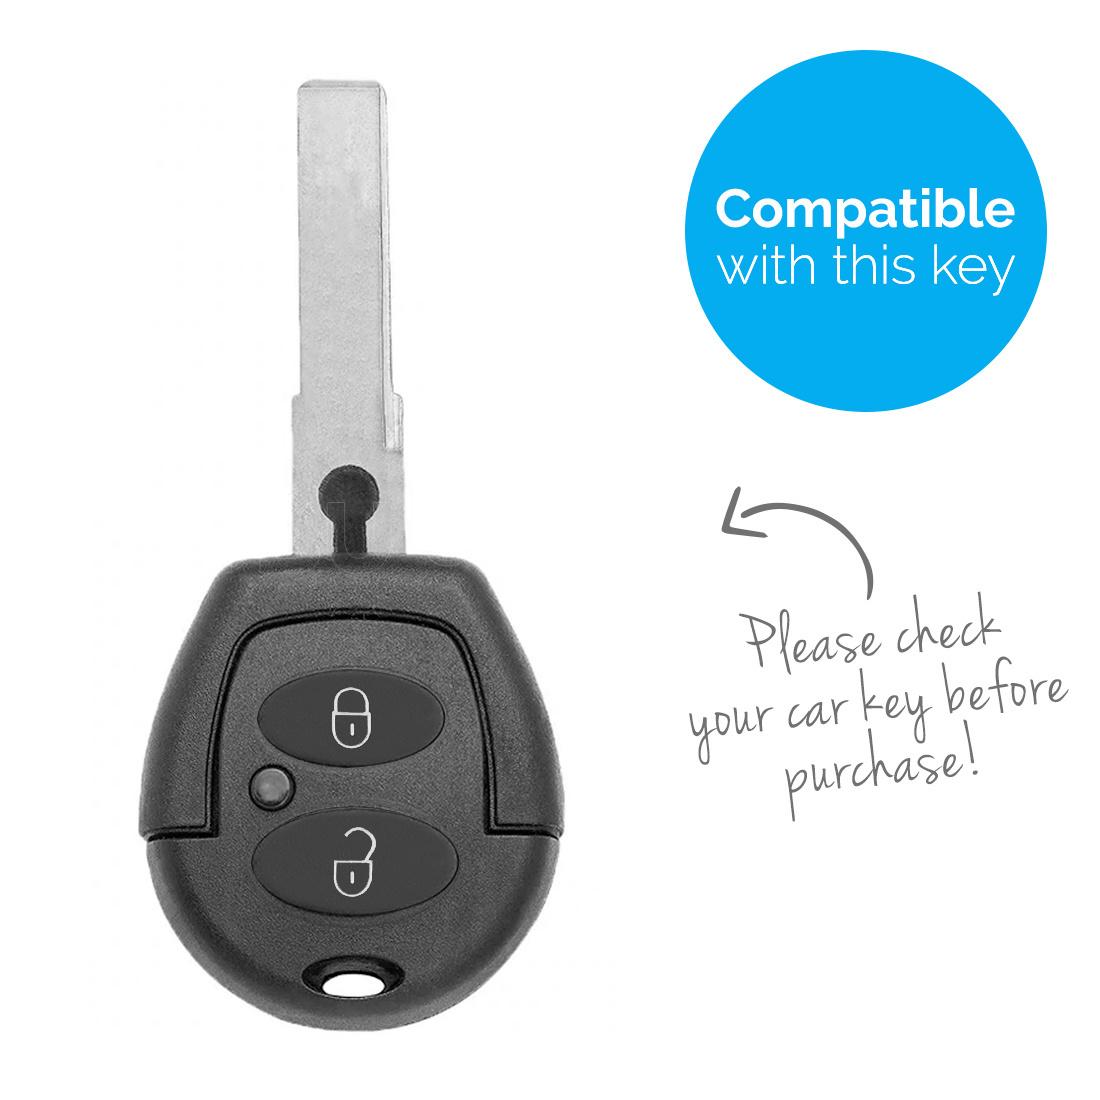 TBU car TBU car Sleutel cover compatibel met Seat - Silicone sleutelhoesje - beschermhoesje autosleutel - Paars